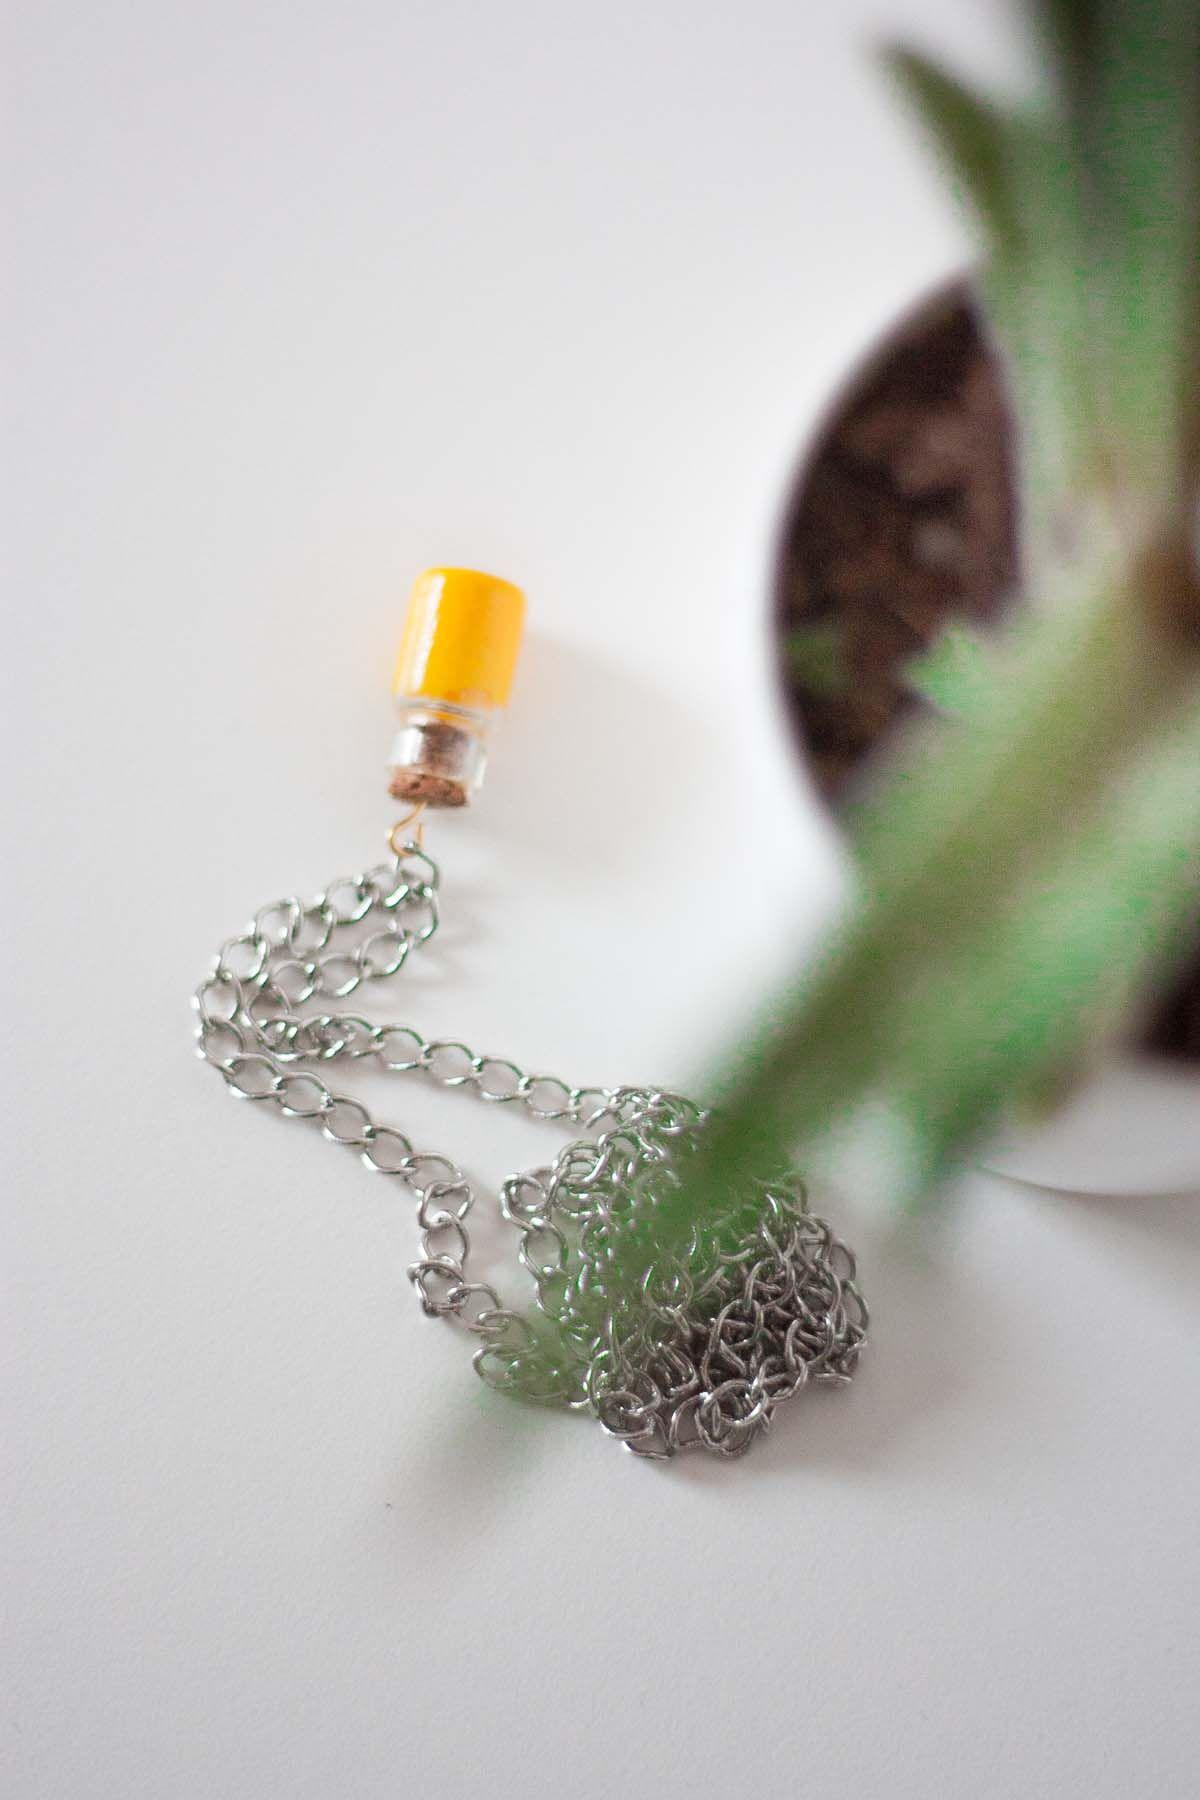 Diy mini bottle pendant necklace gift